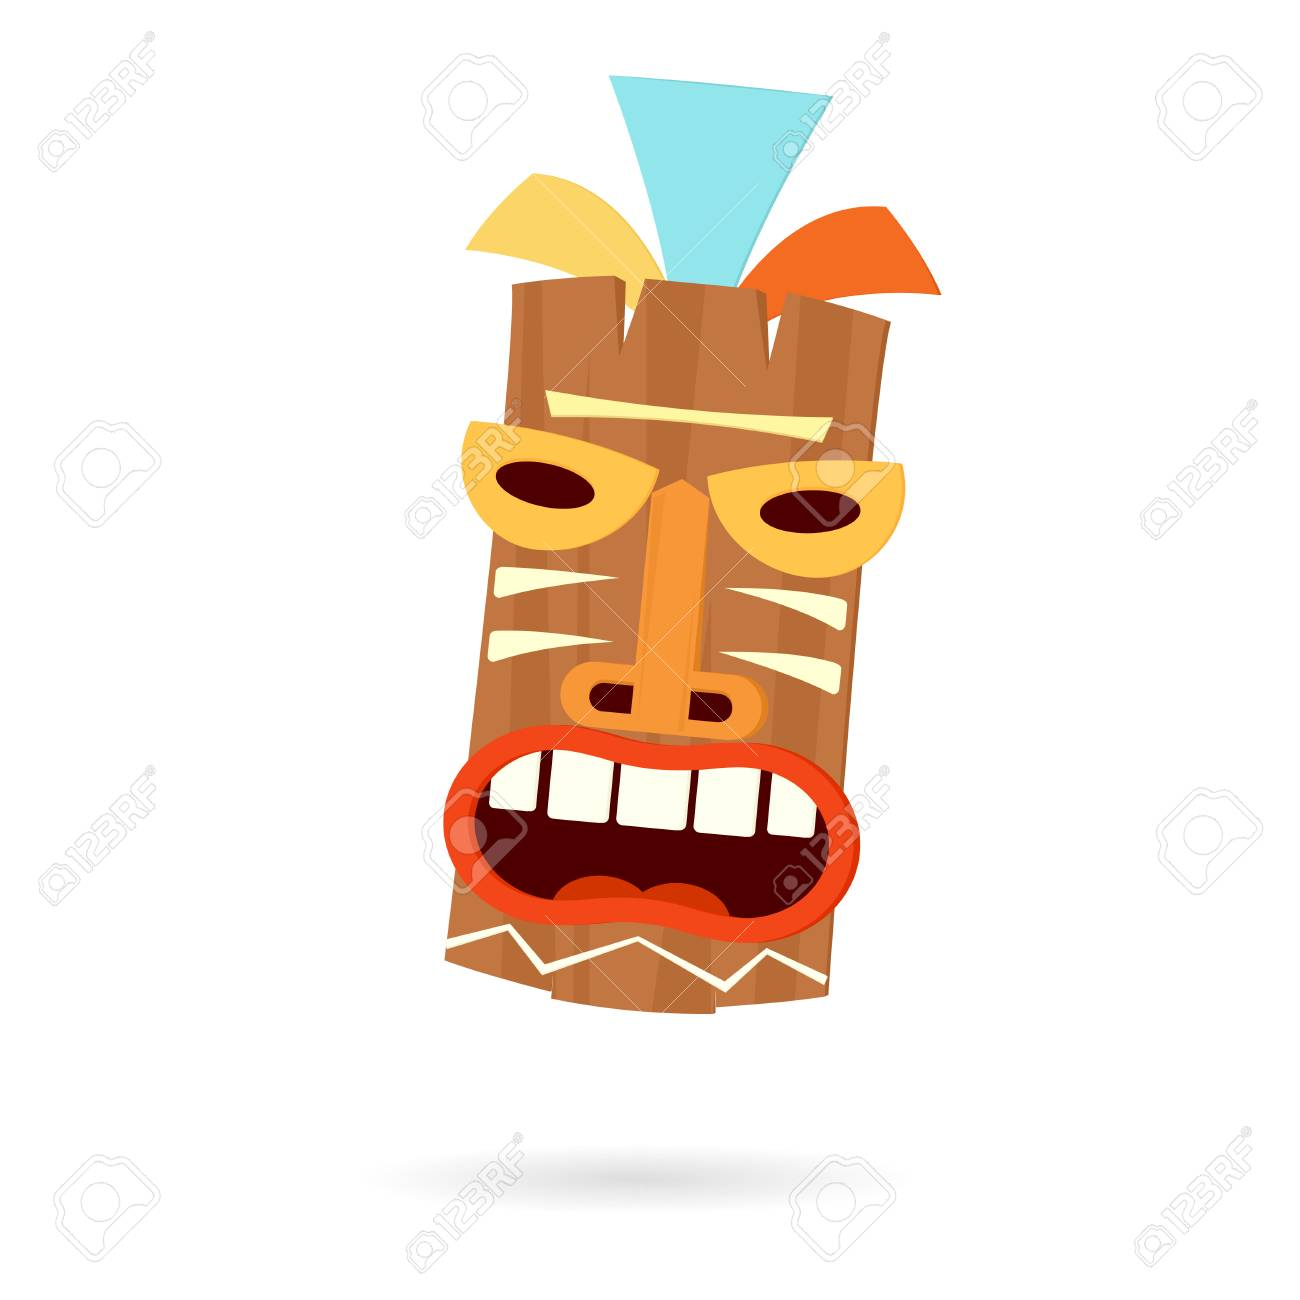 Tiki Mask Head Clip-art Design Illustration. Royalty Free Cliparts ...